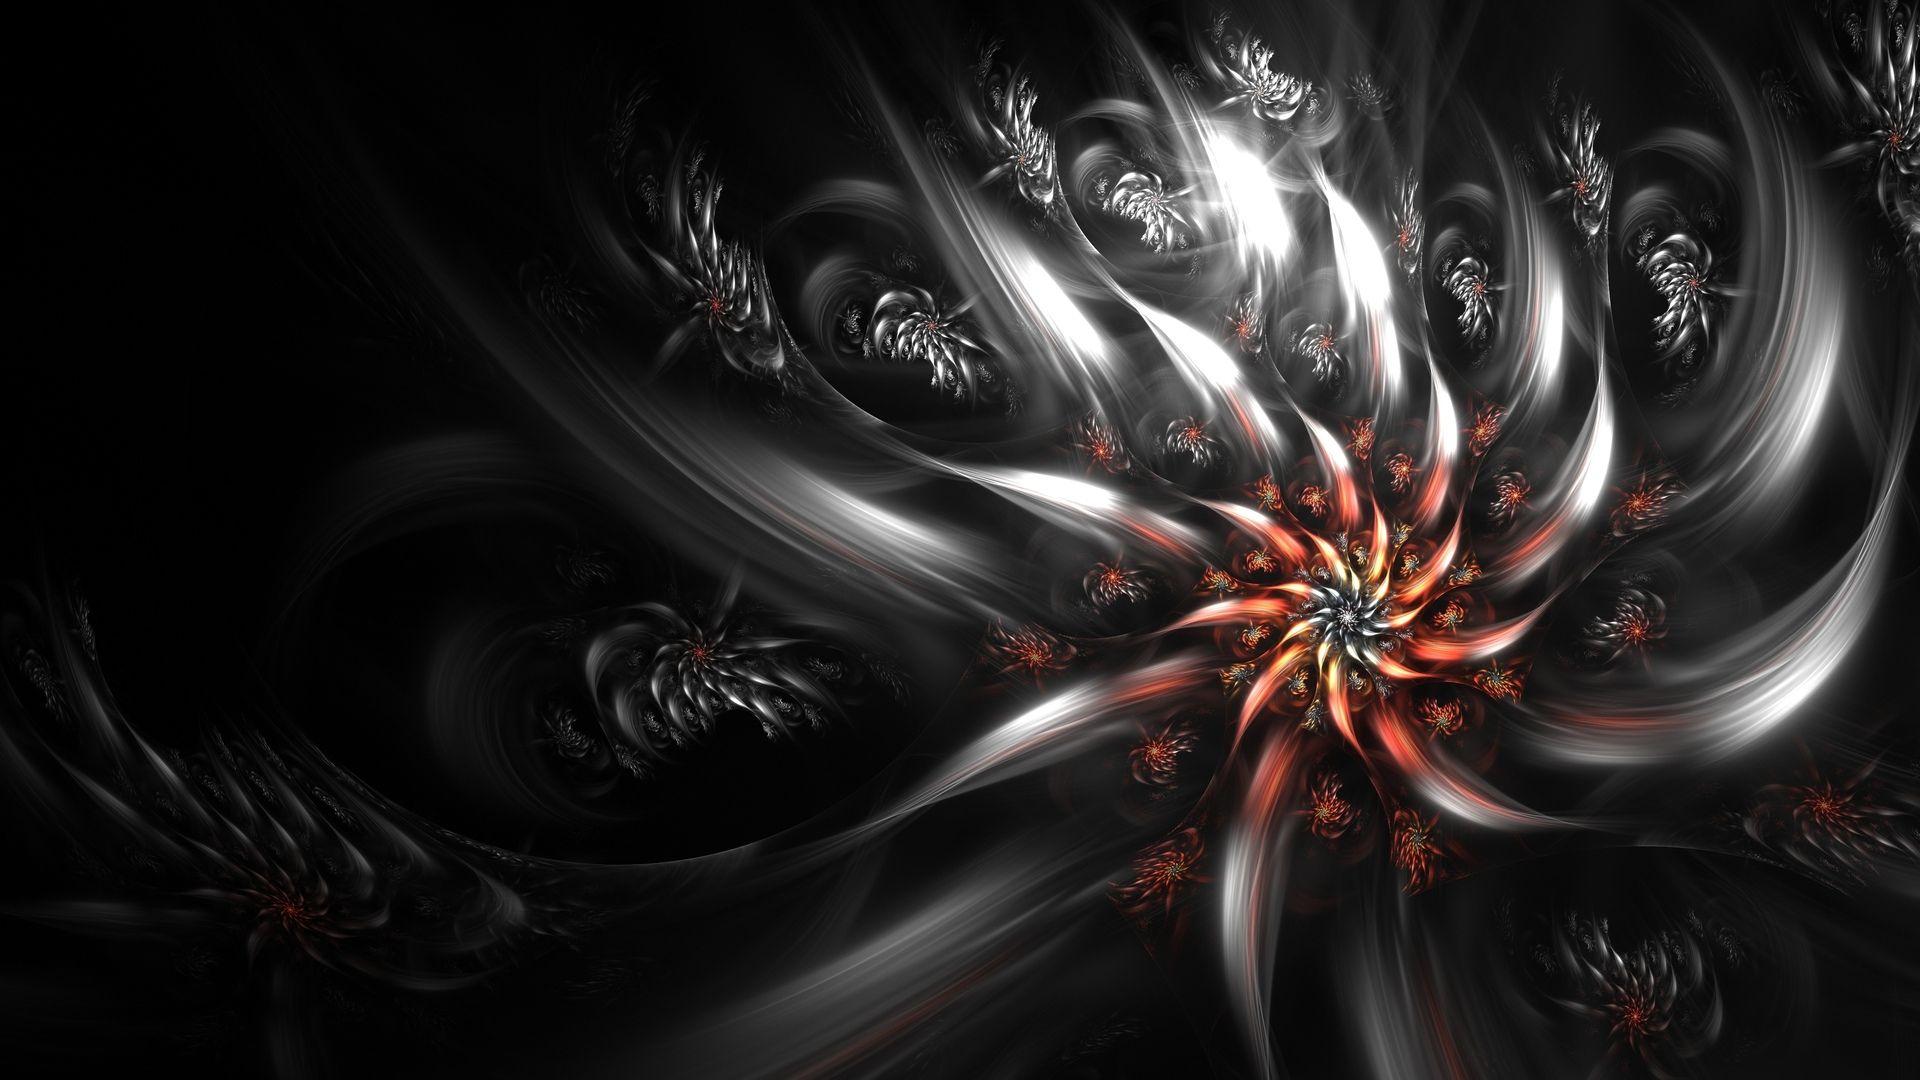 Fractal Flower hd wallpaper 1080